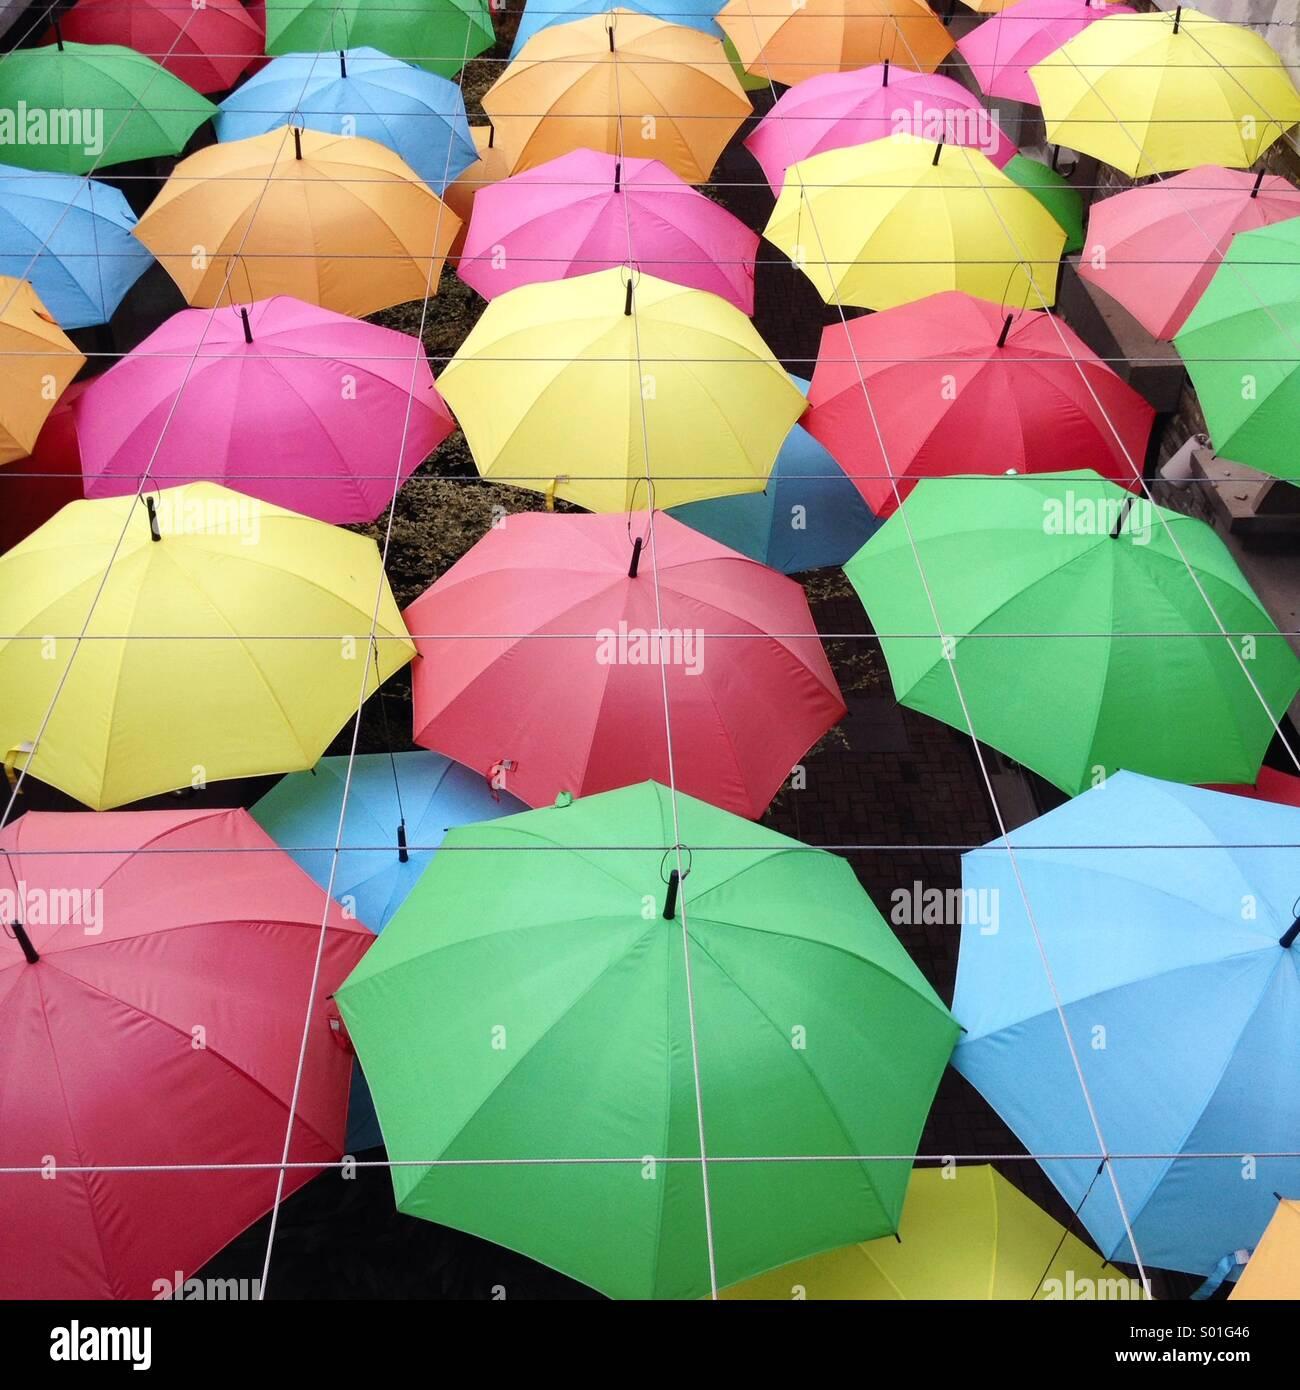 Colorful Umbrellas - Stock Image